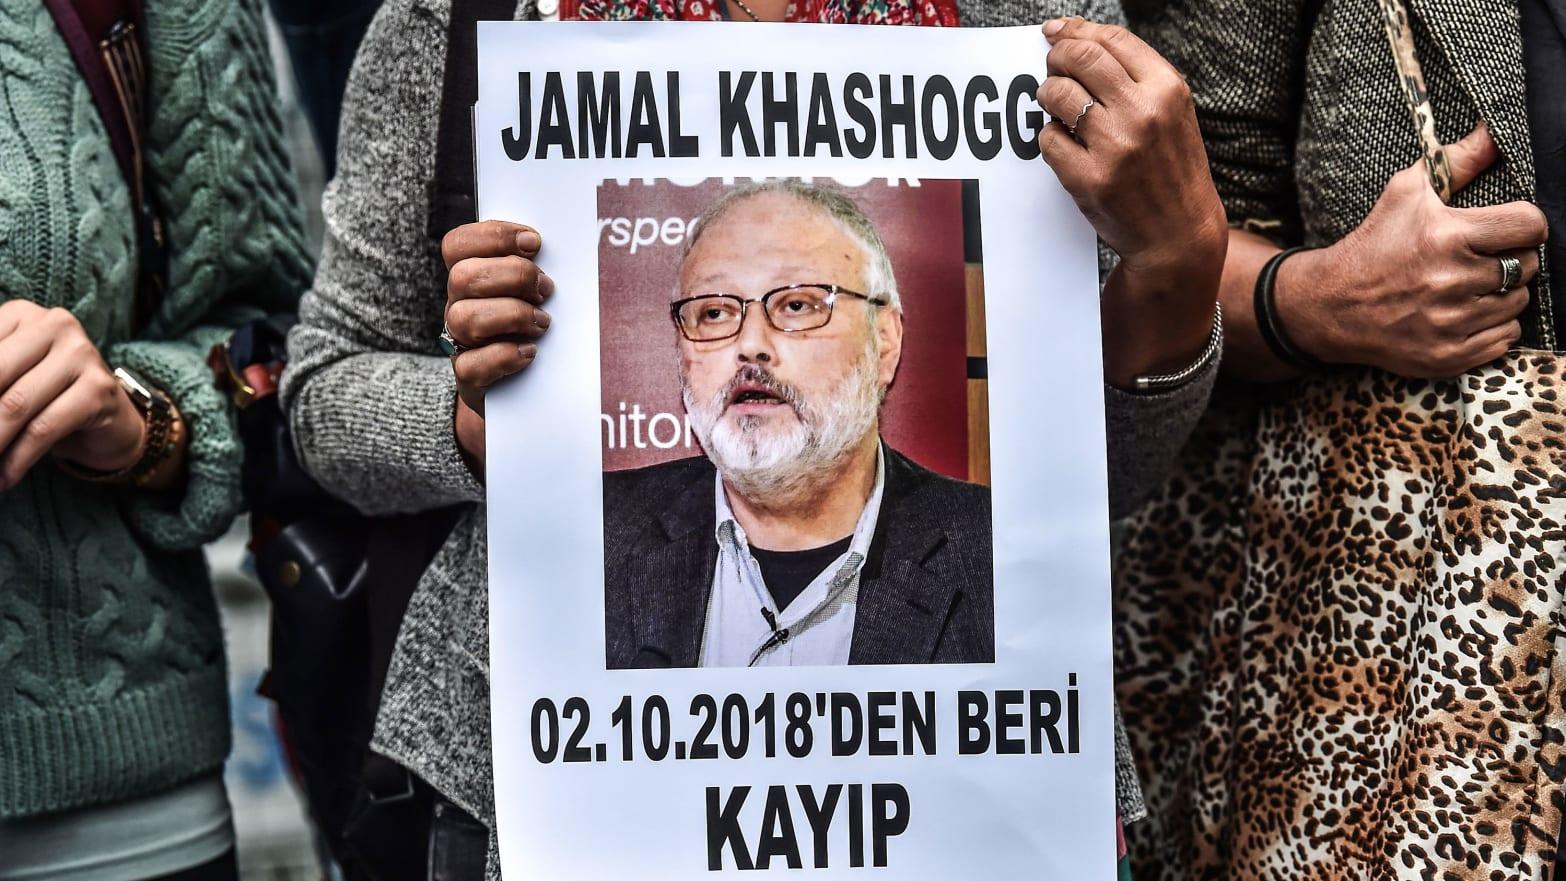 Khashoggi Coverup: Exposing Trump's Efforts to Defend the Mastermind Behind His Murder